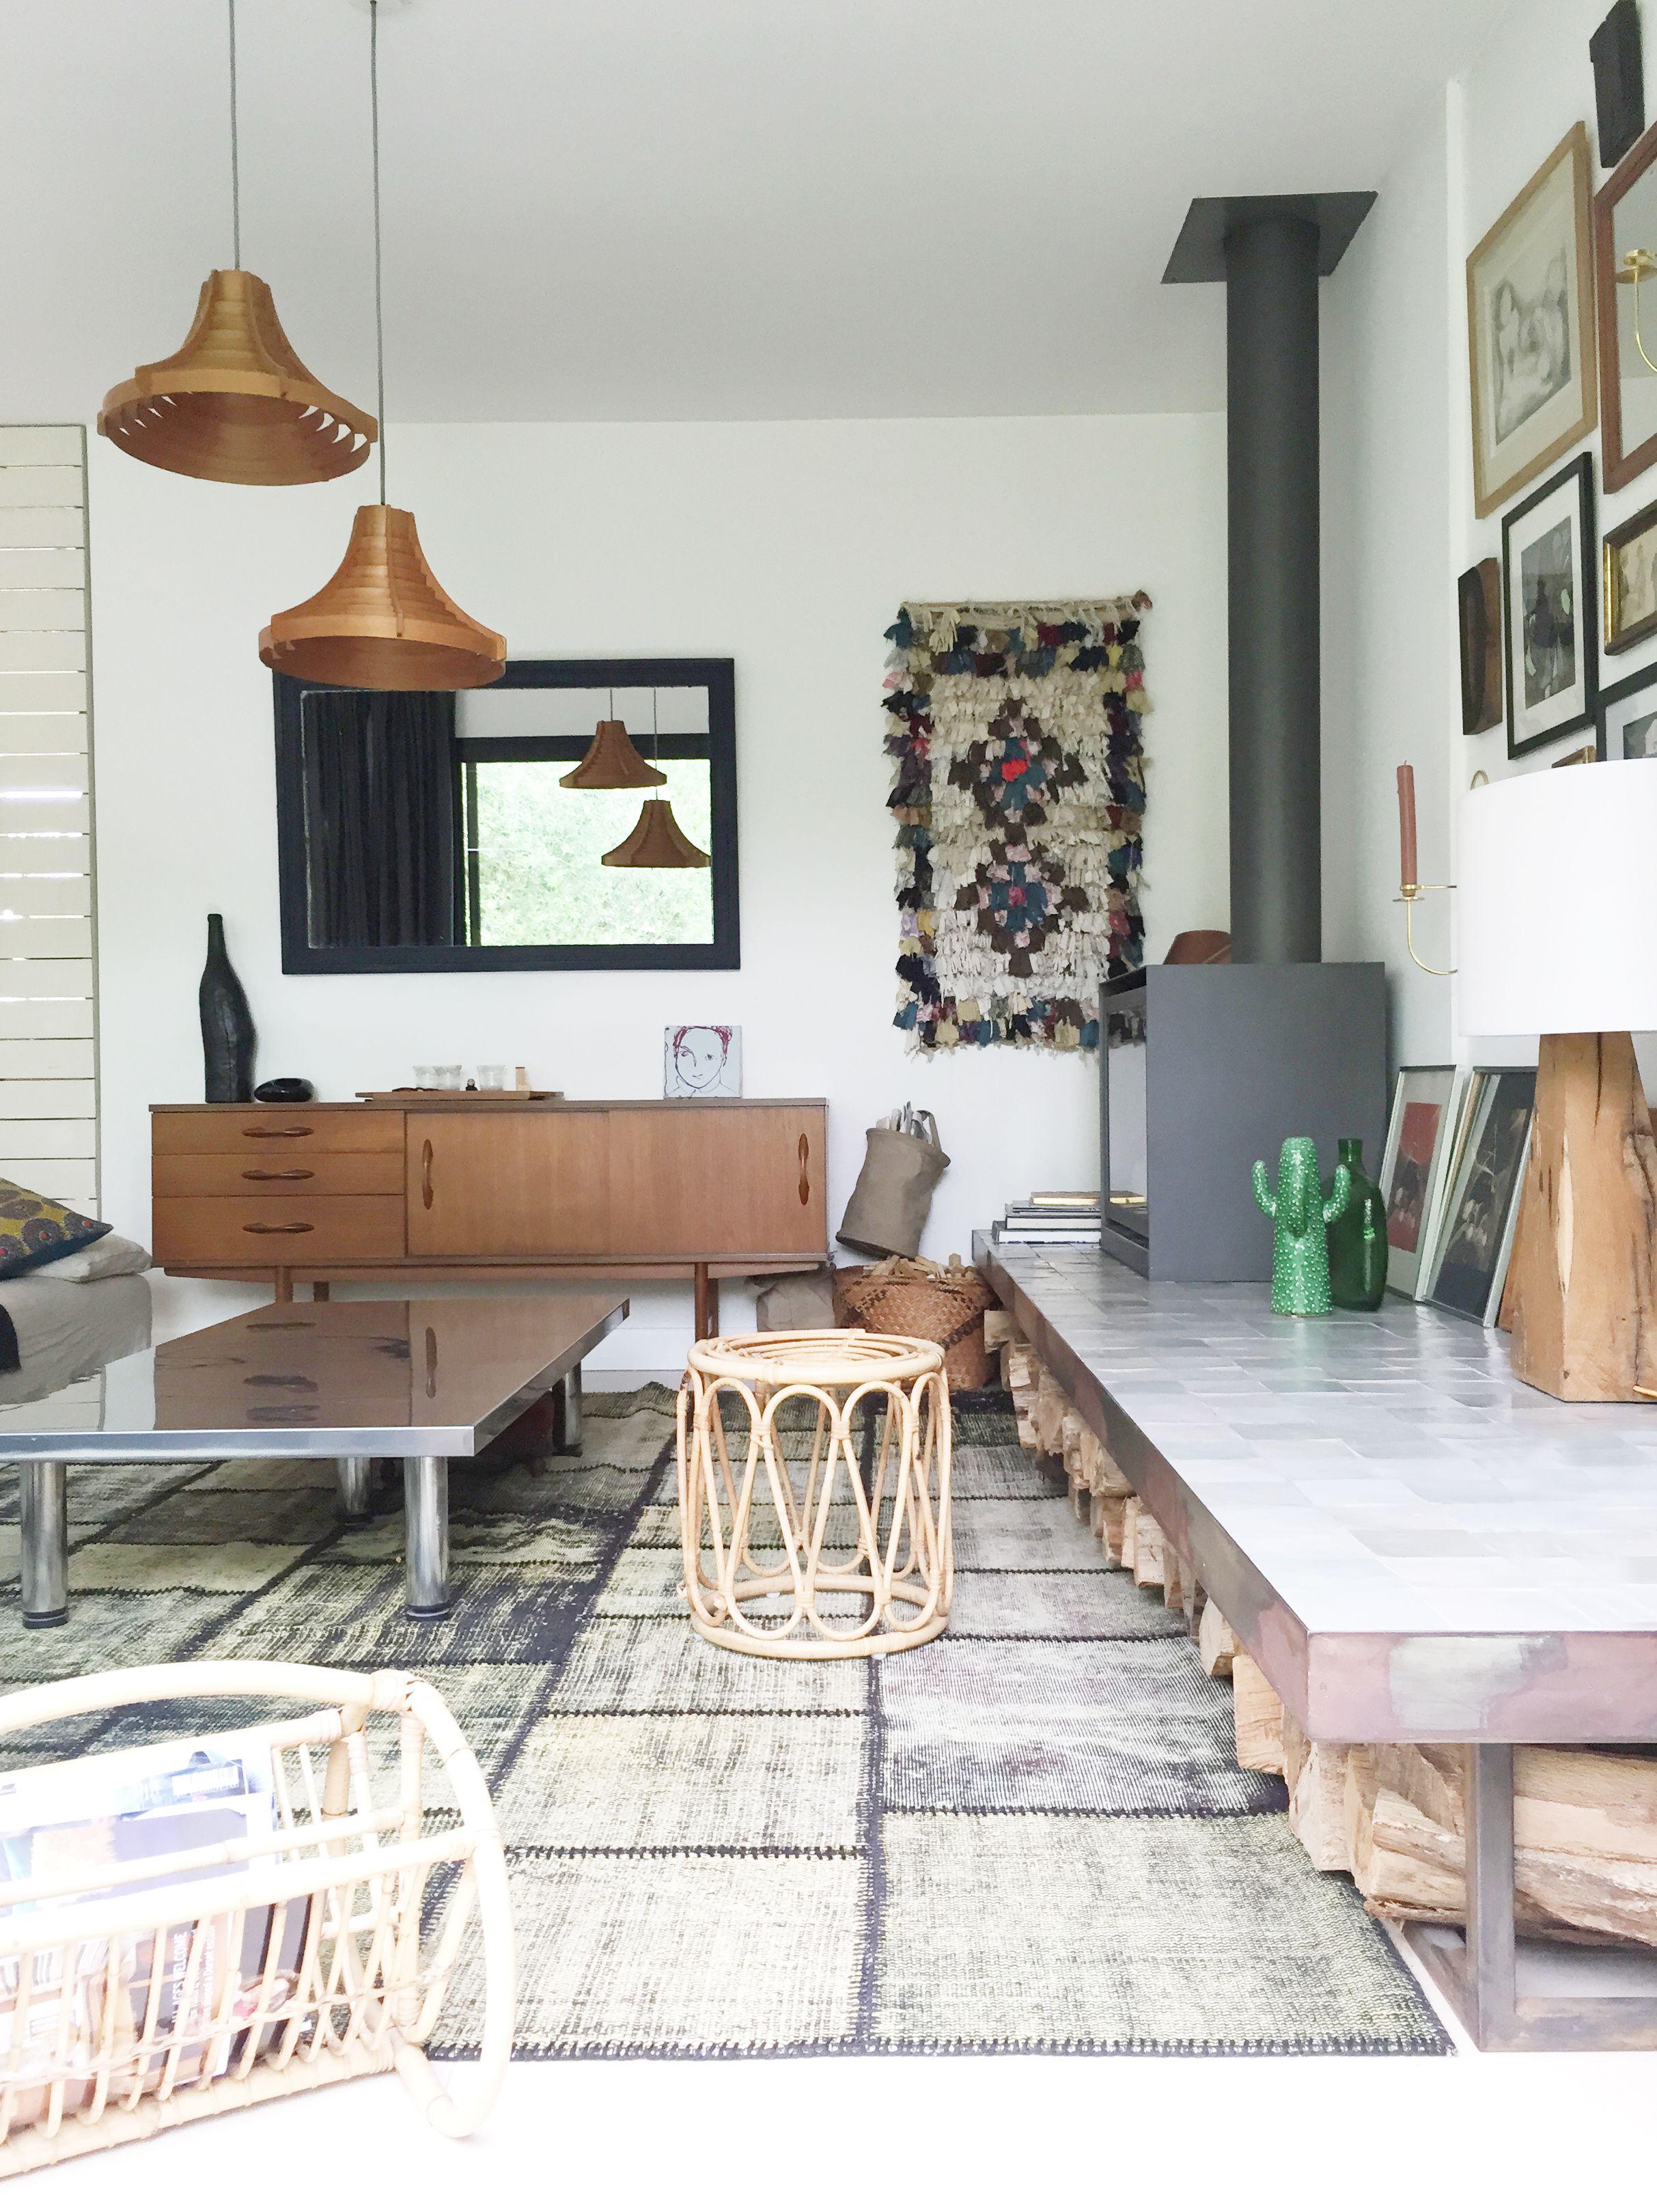 Brocante En Ligne Selency living room / bohemian and scandinave style / rattan